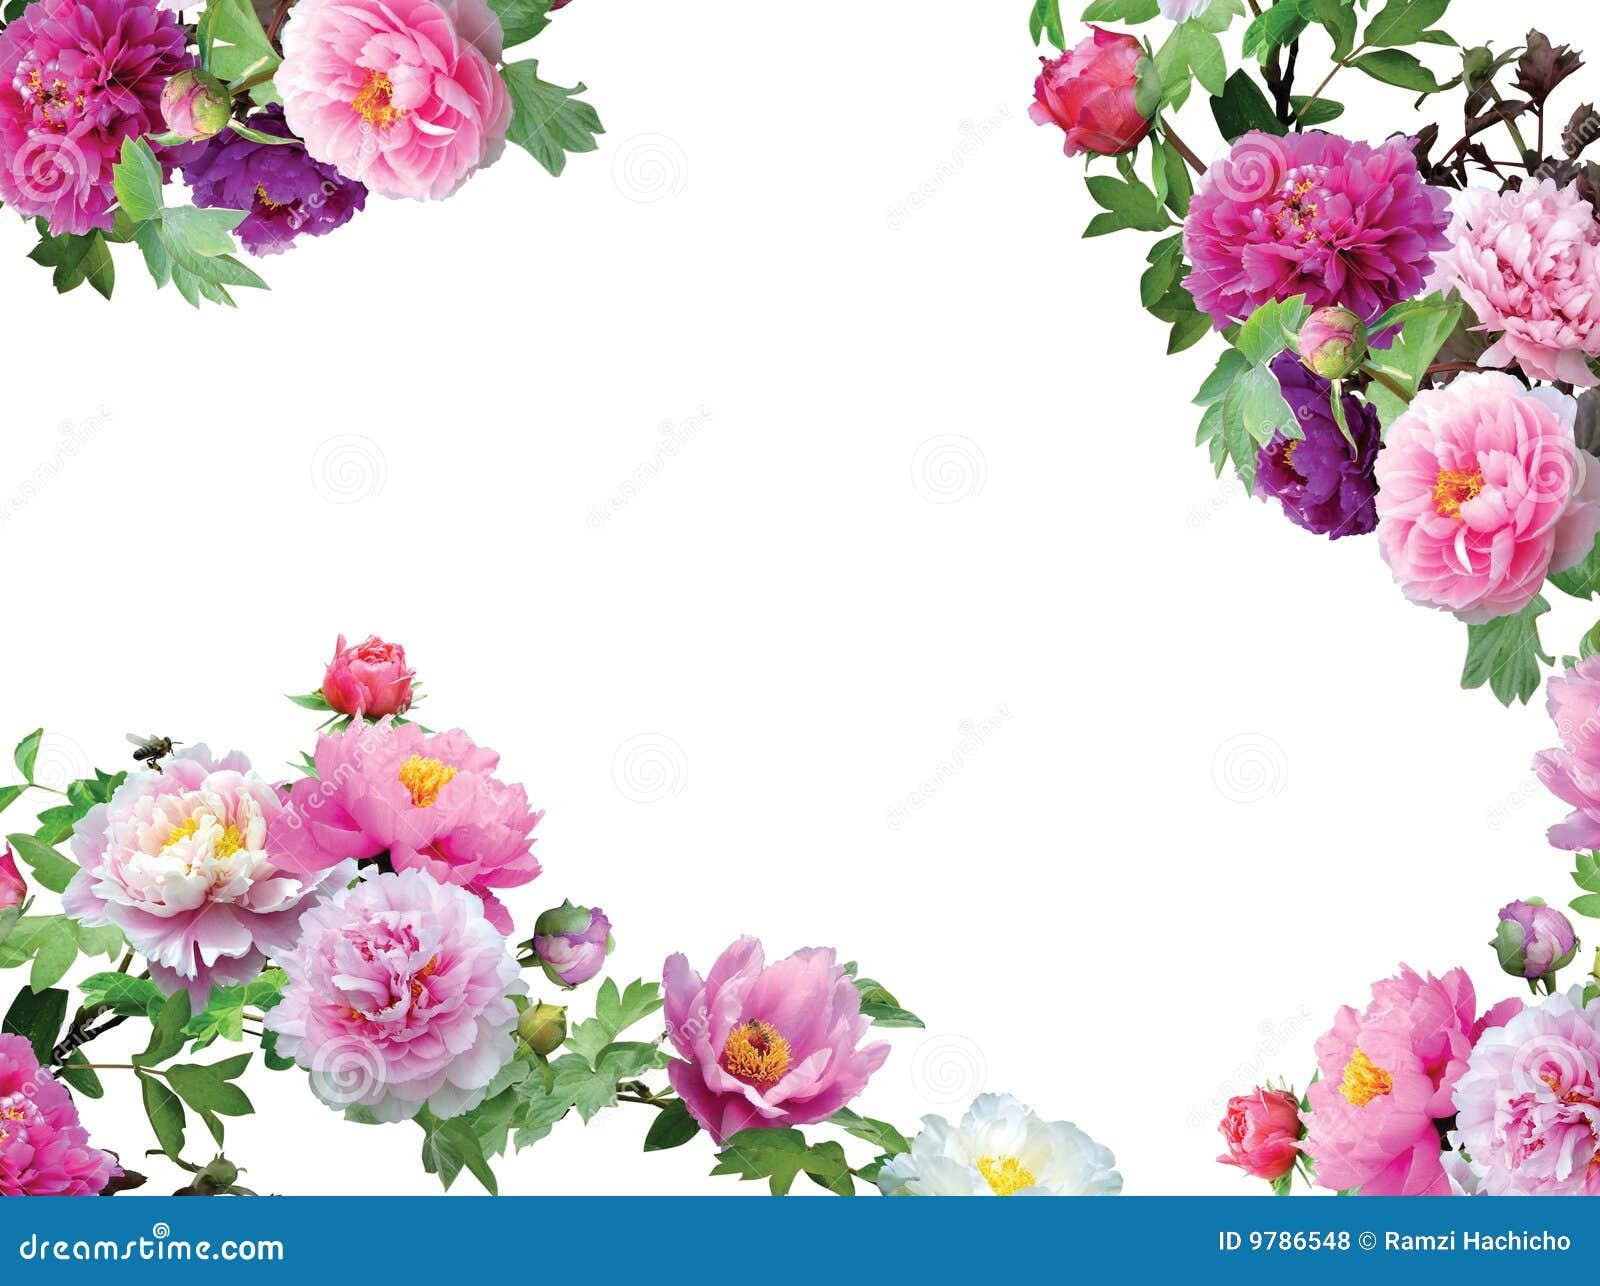 the arrangement free pdf charlotte byrd